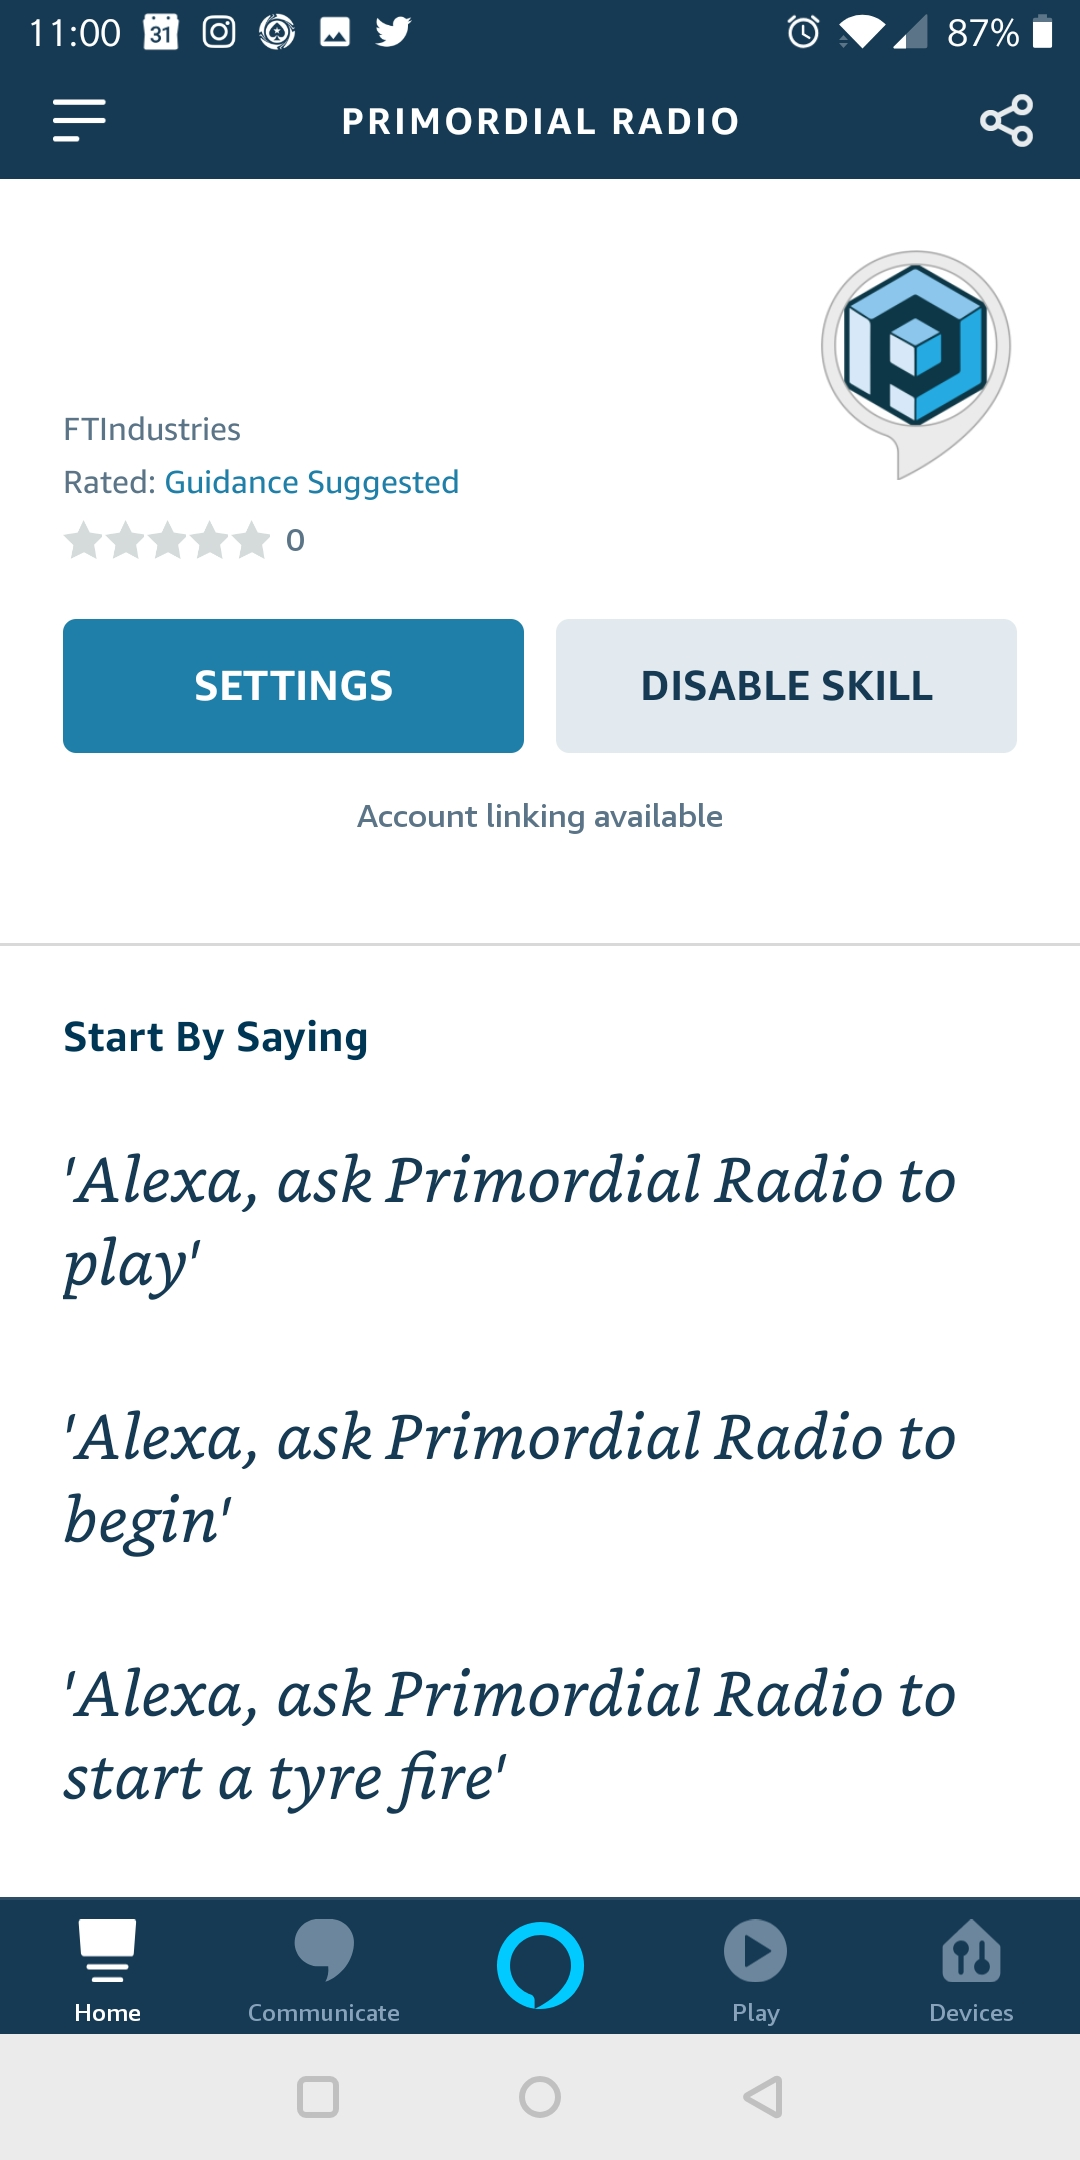 How to get Primordial Radio Skill on Alexa | Primordial Radio - Rock